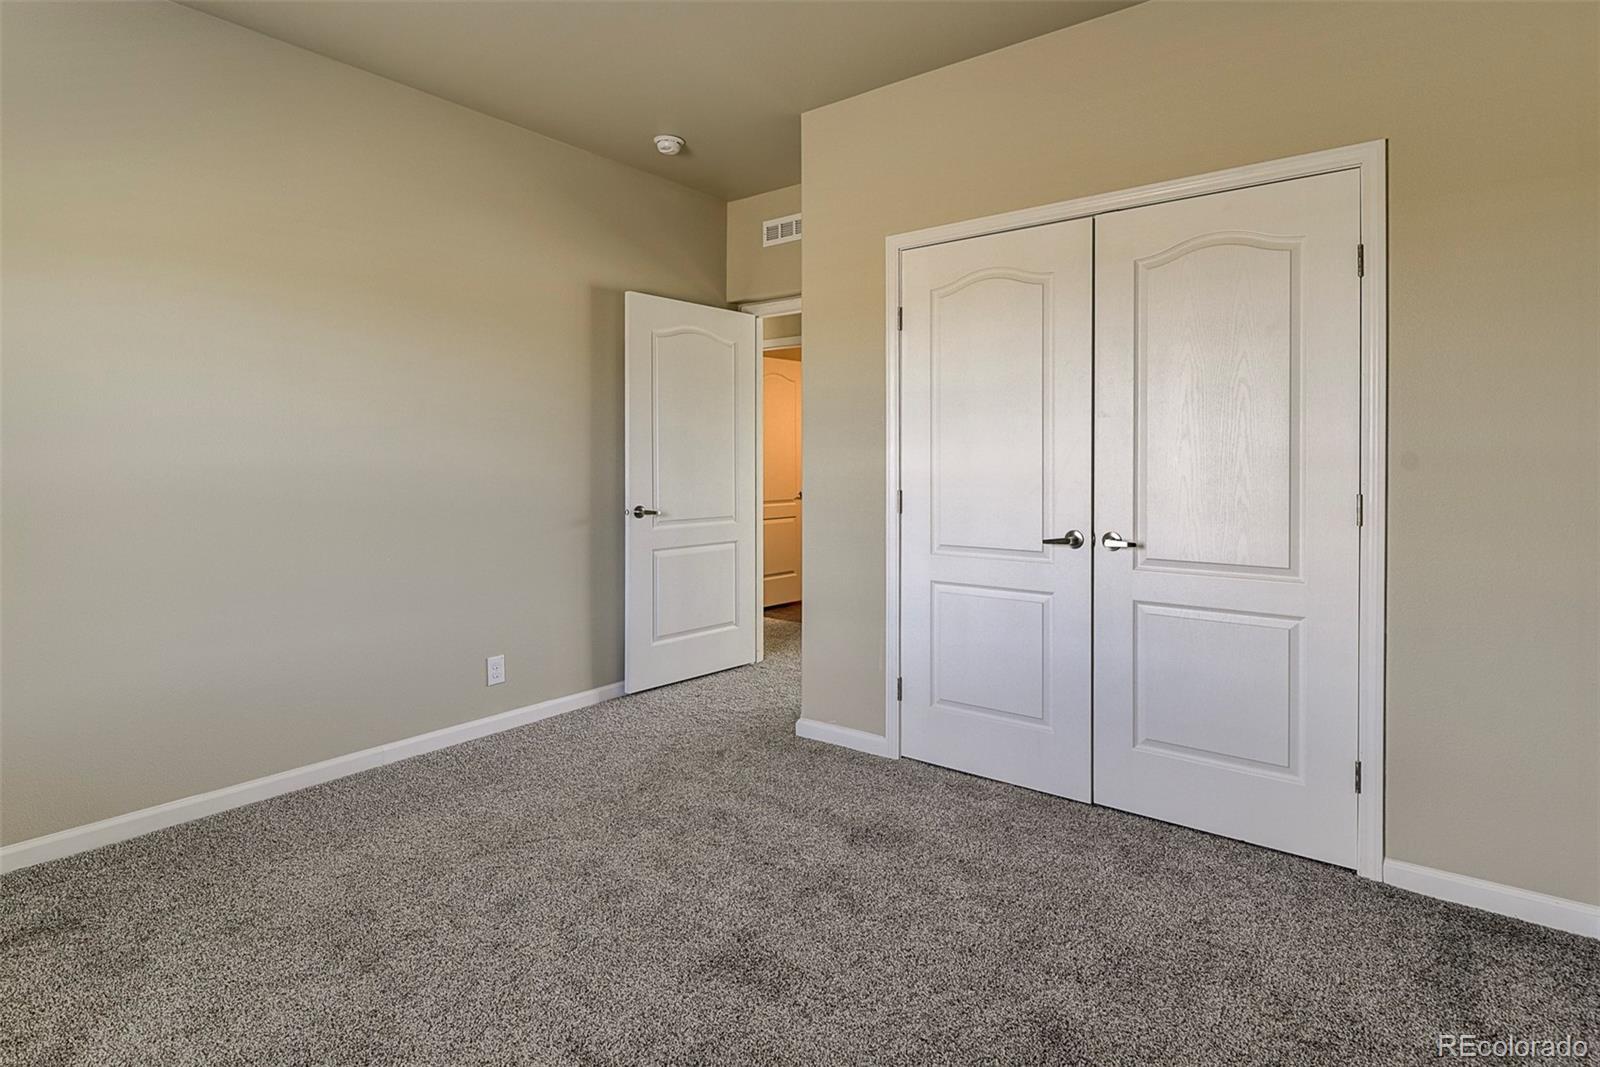 MLS# 7338899 - 27 - 964 Purcell Place, Pueblo West, CO 81007